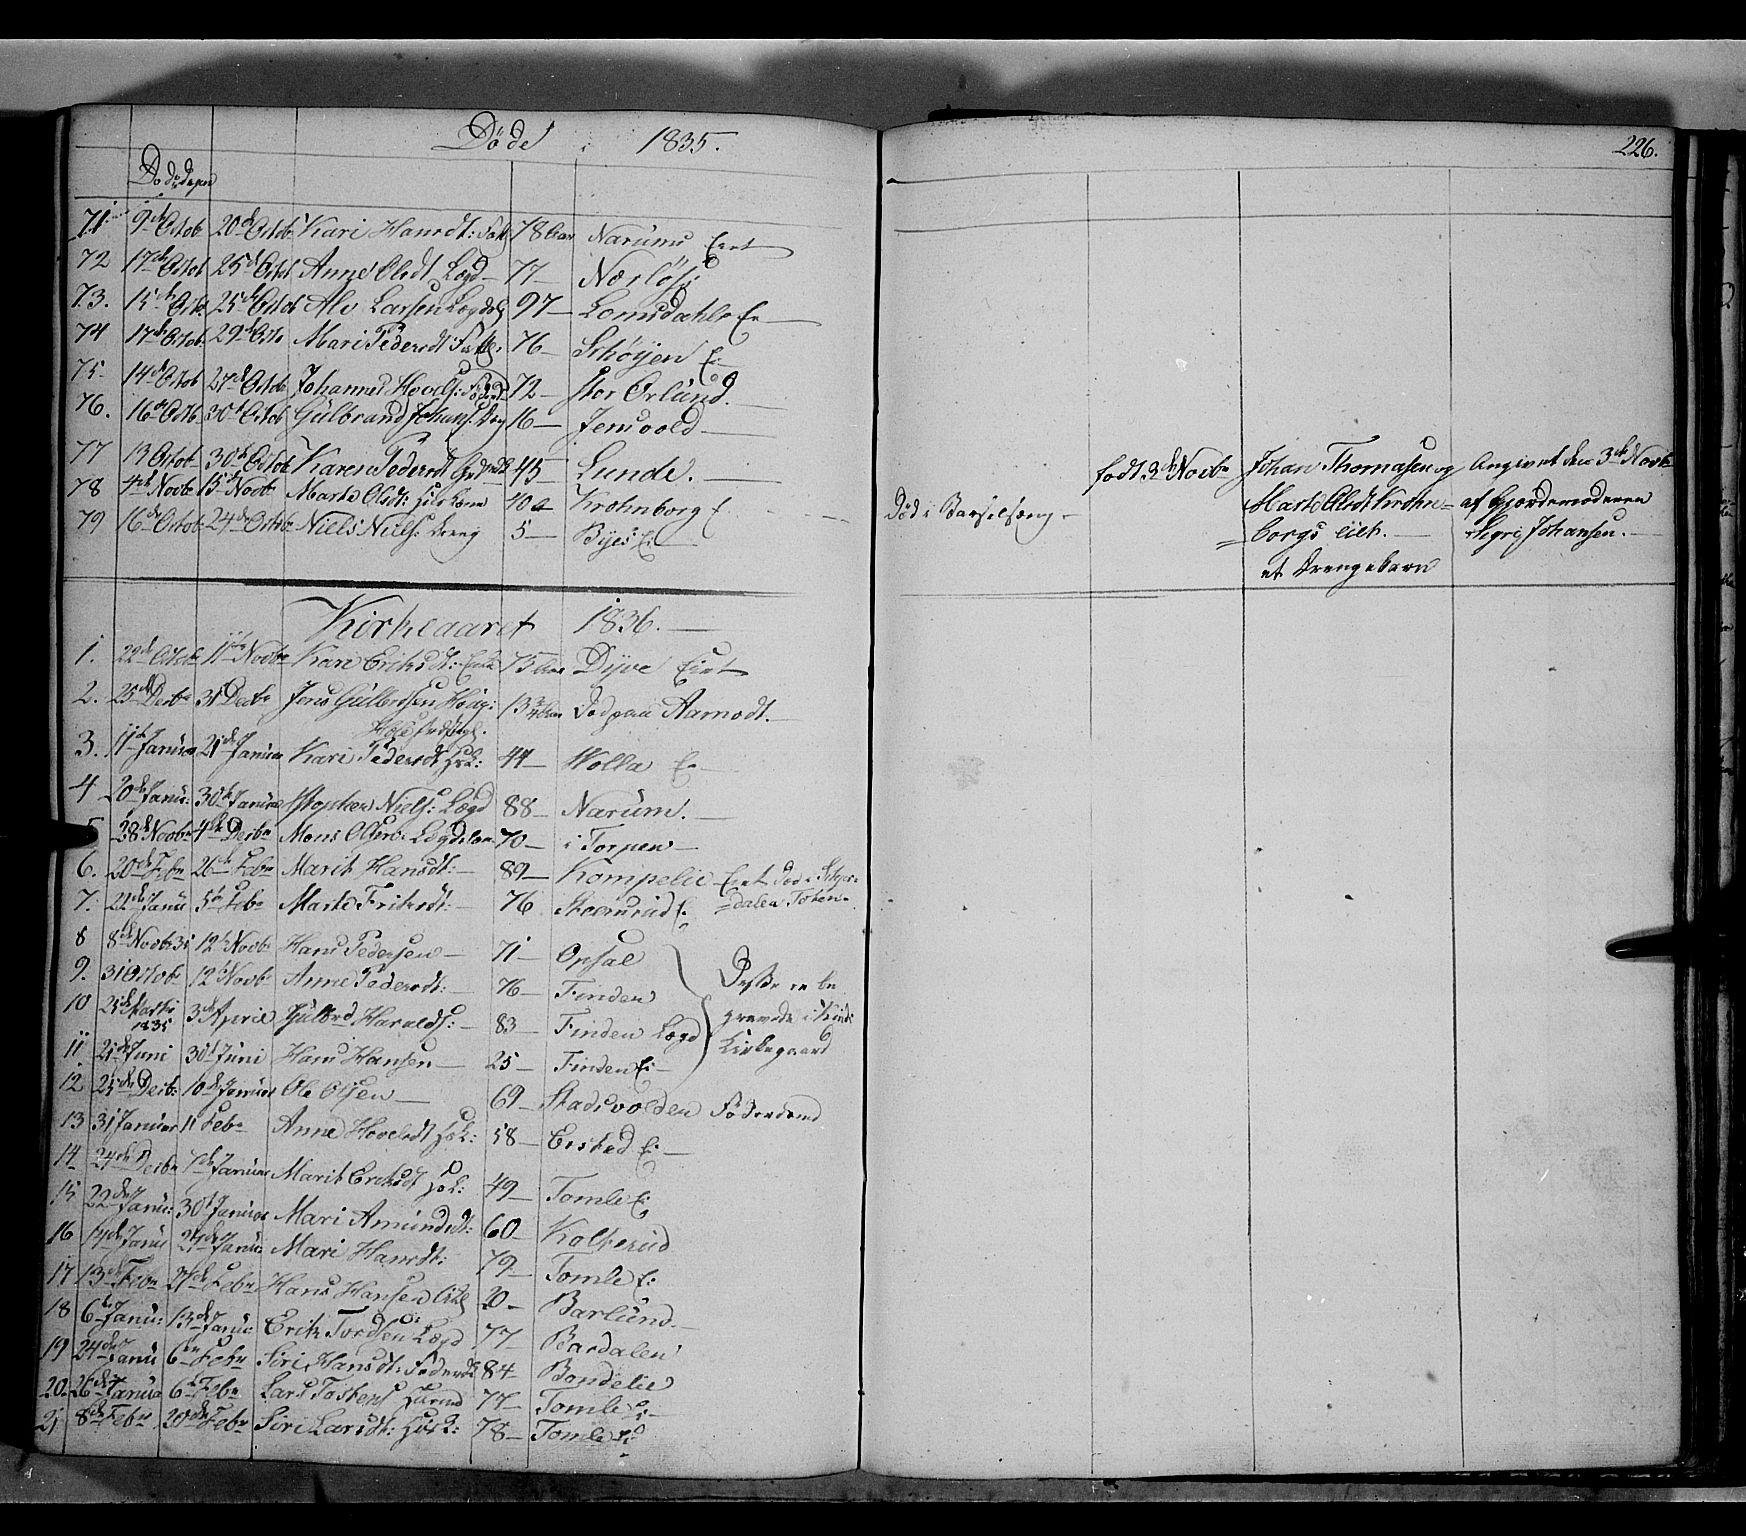 SAH, Land prestekontor, Klokkerbok nr. 2, 1833-1849, s. 226